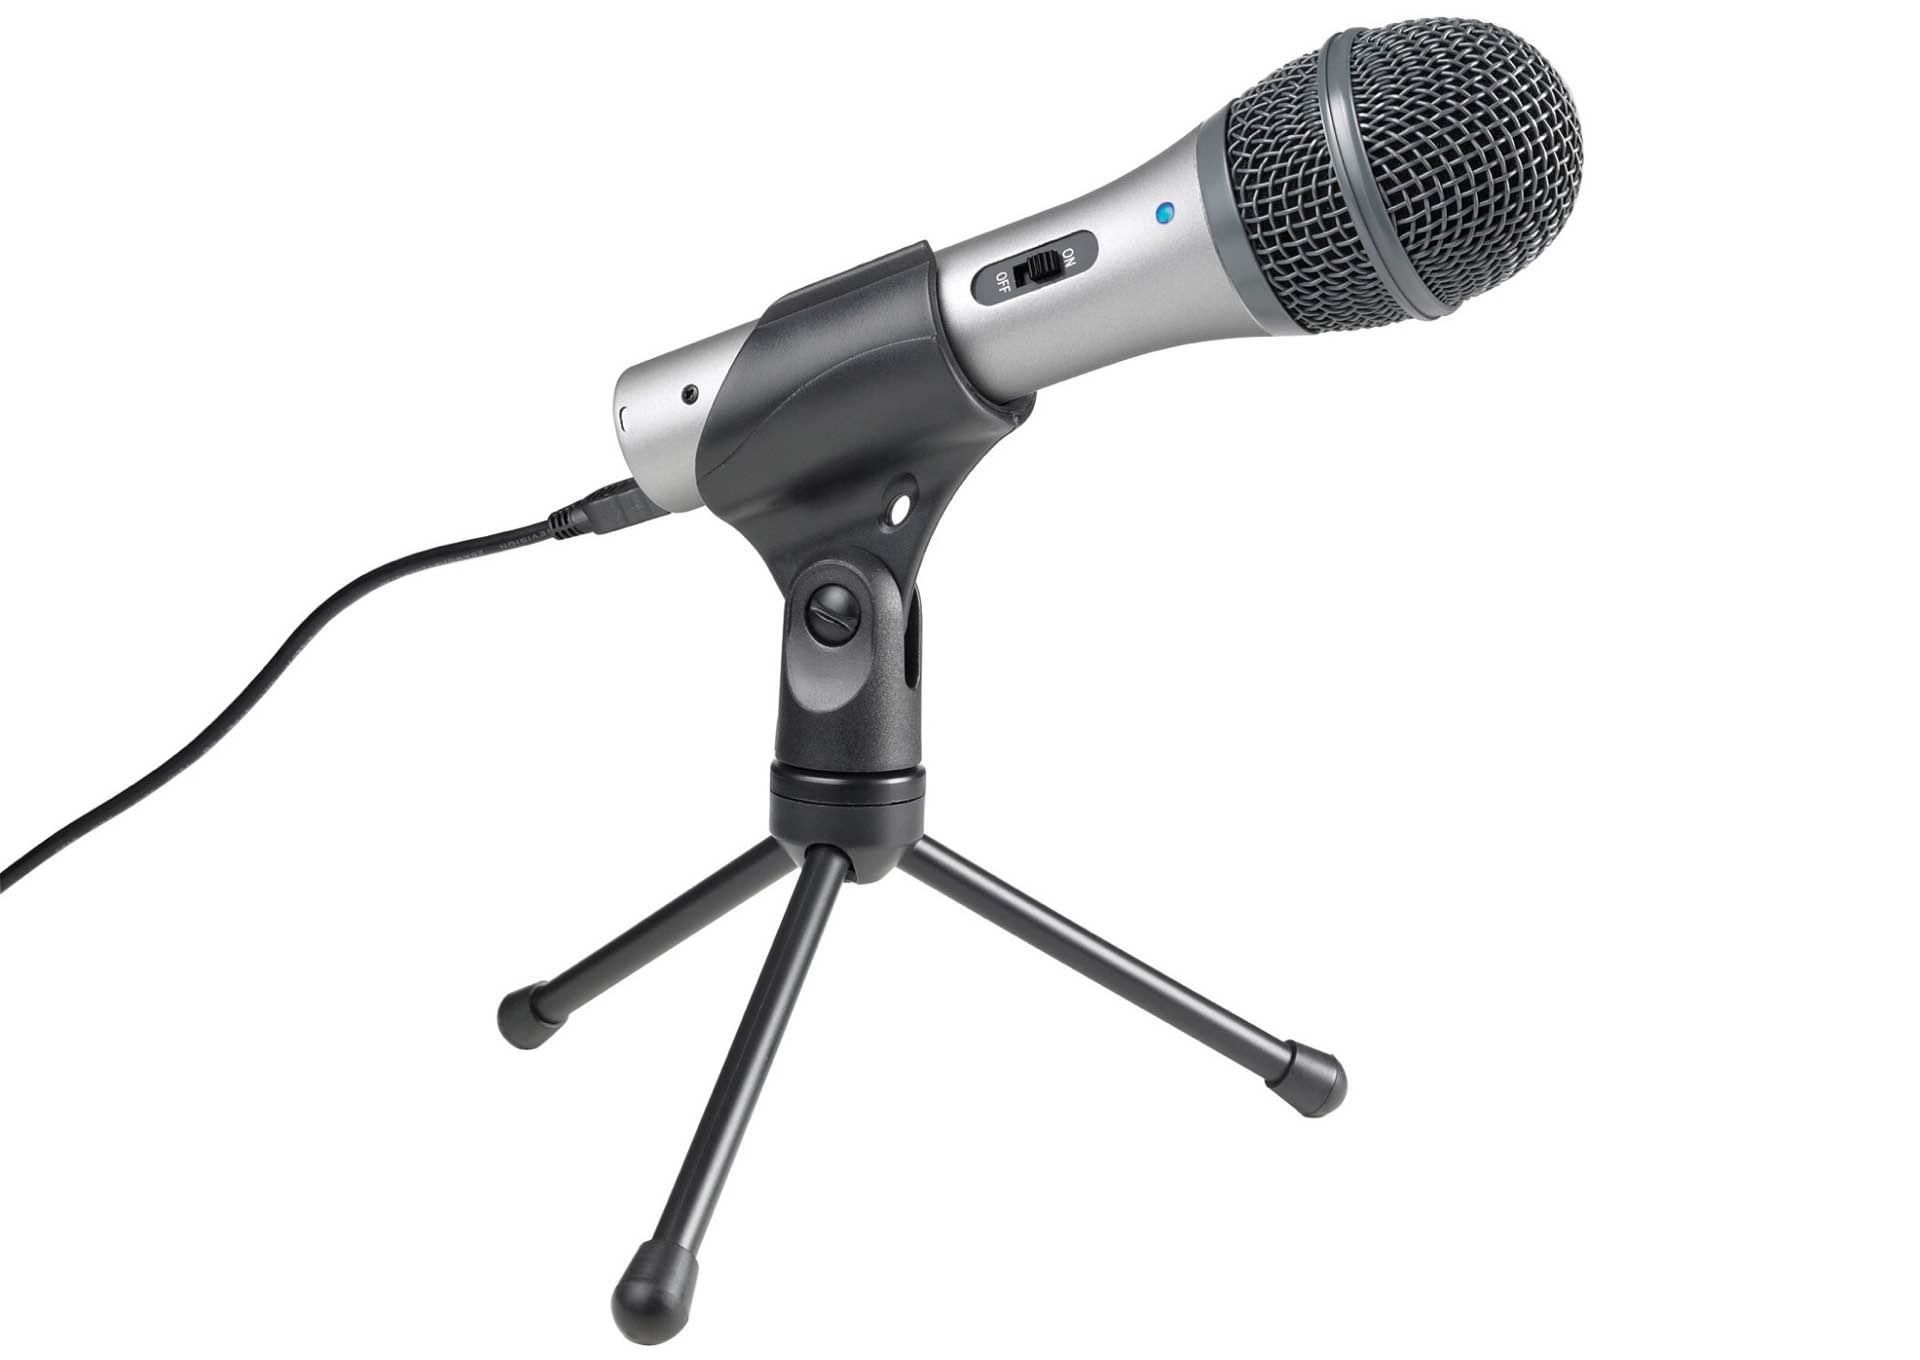 Audio-Technica ATR2100-USB microphone. ($79)